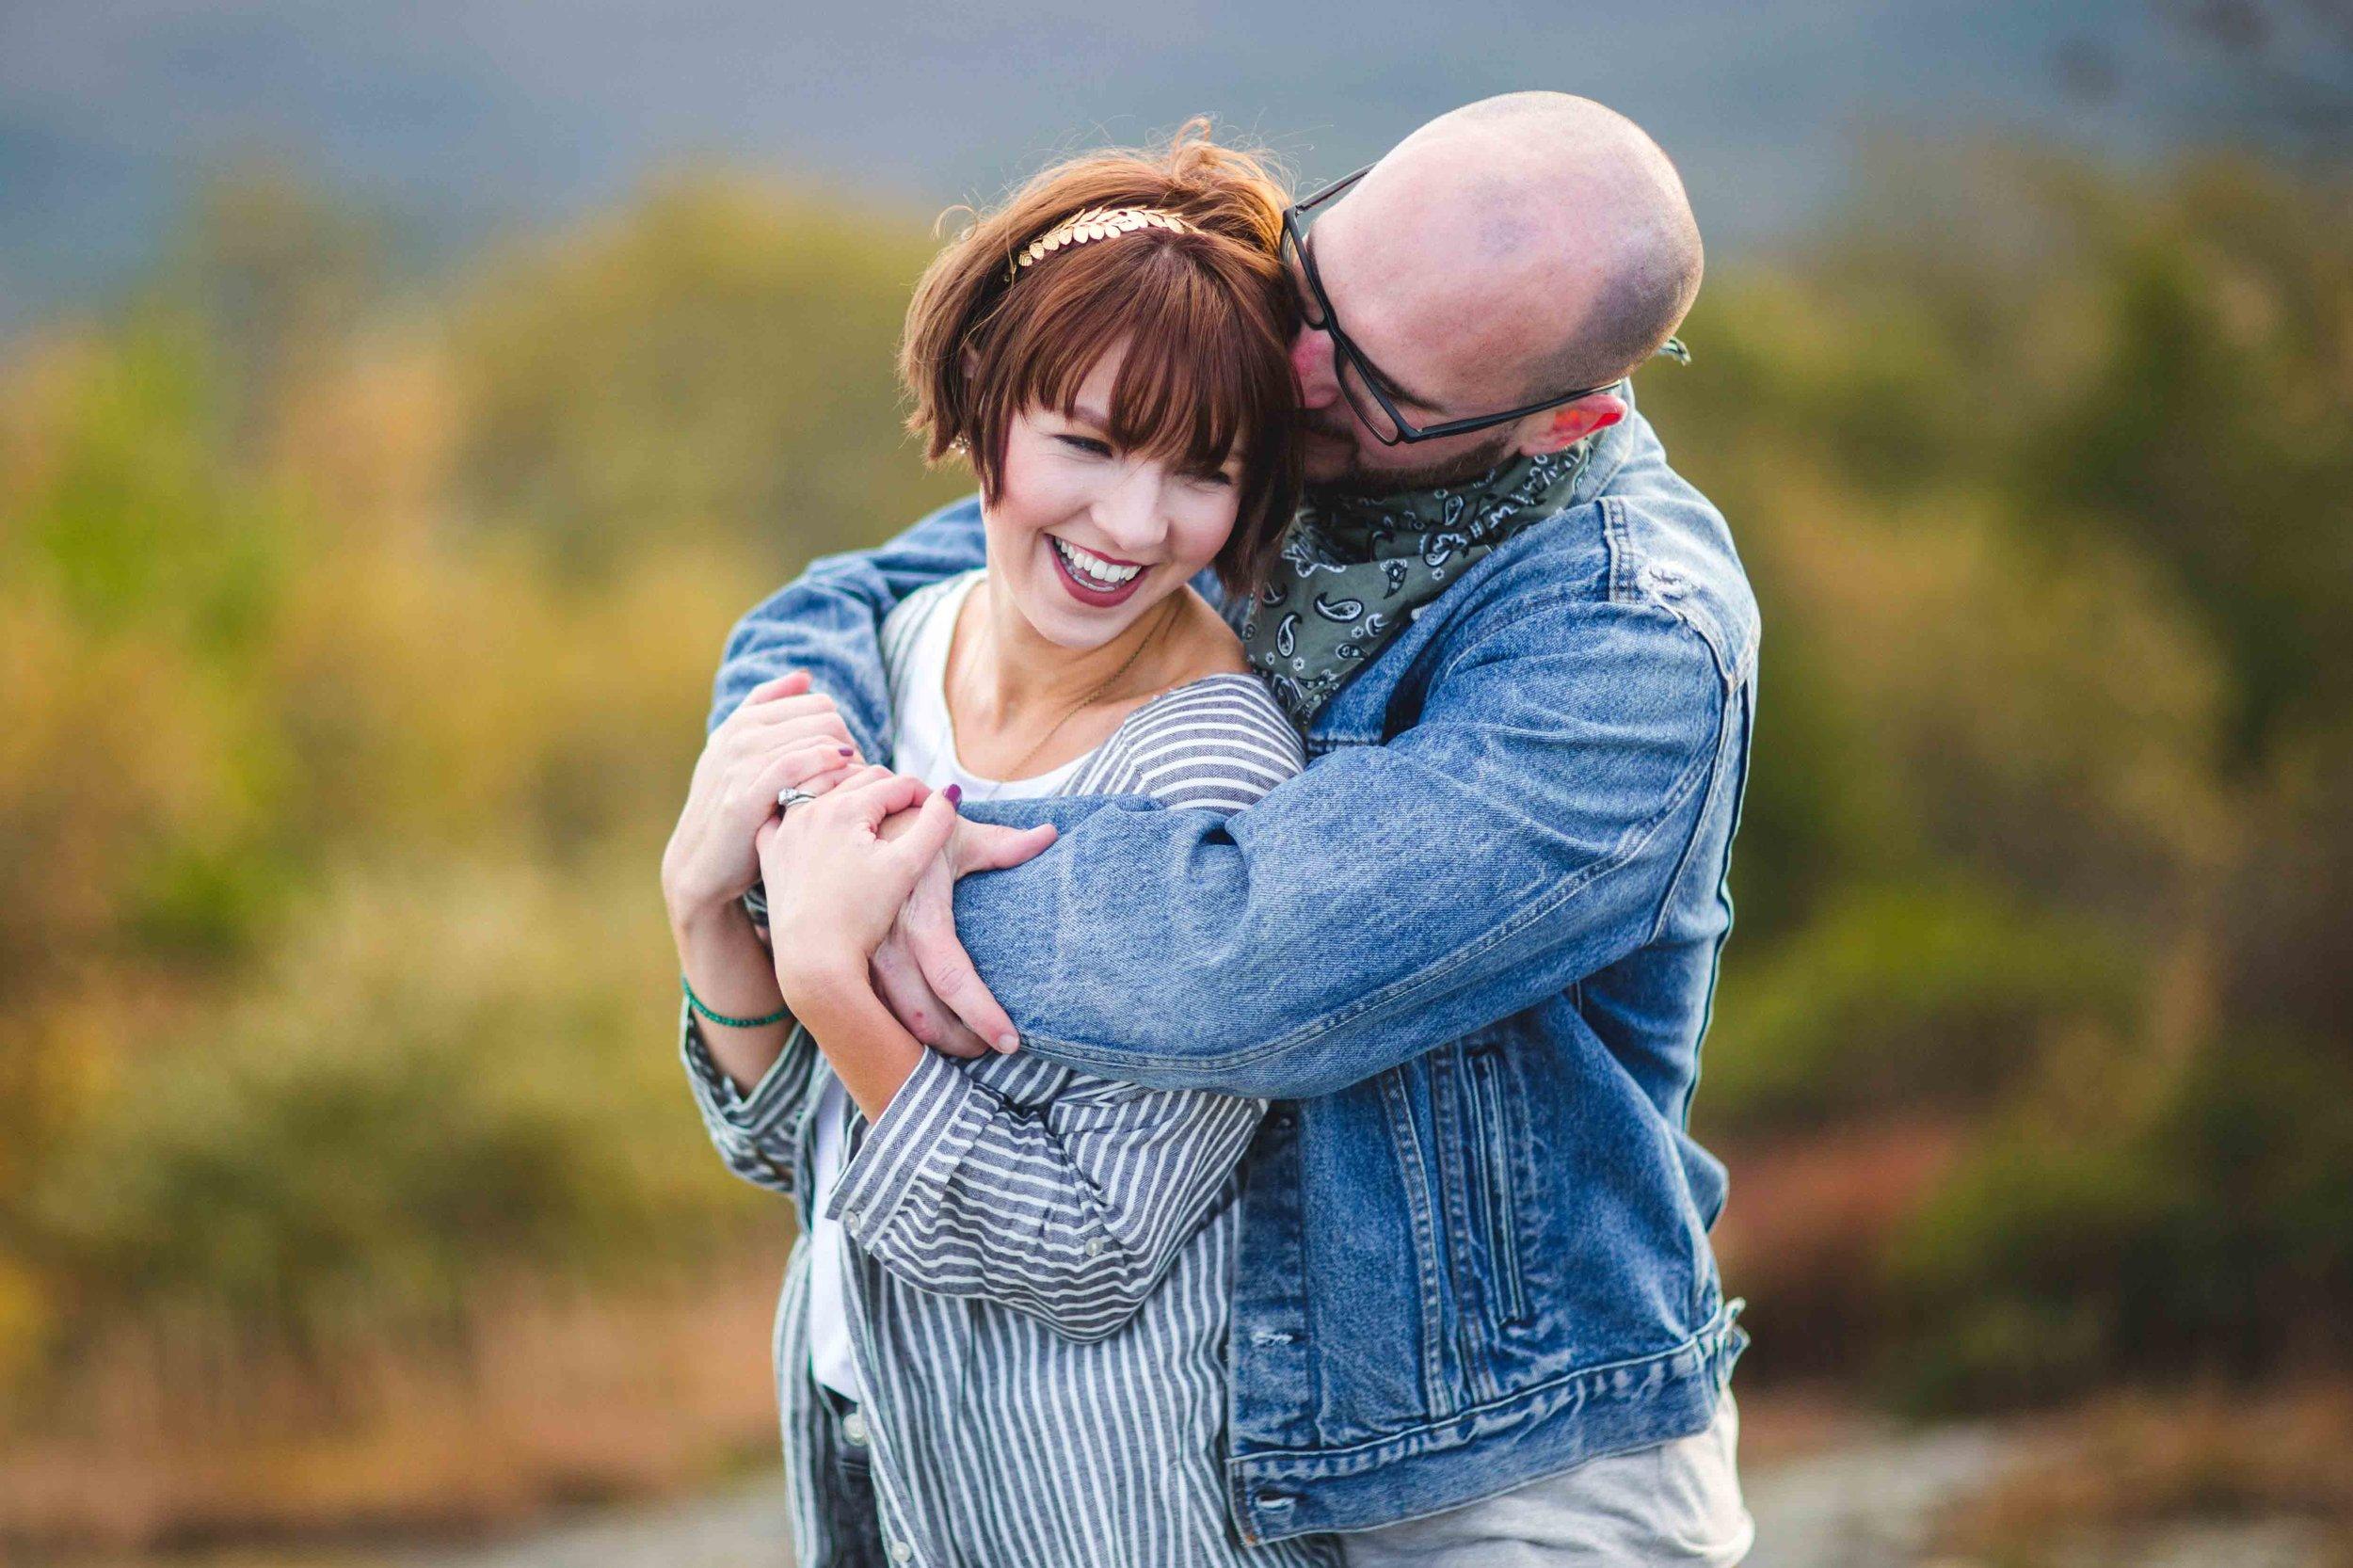 north-carolina-elopement-photographer-13.jpg